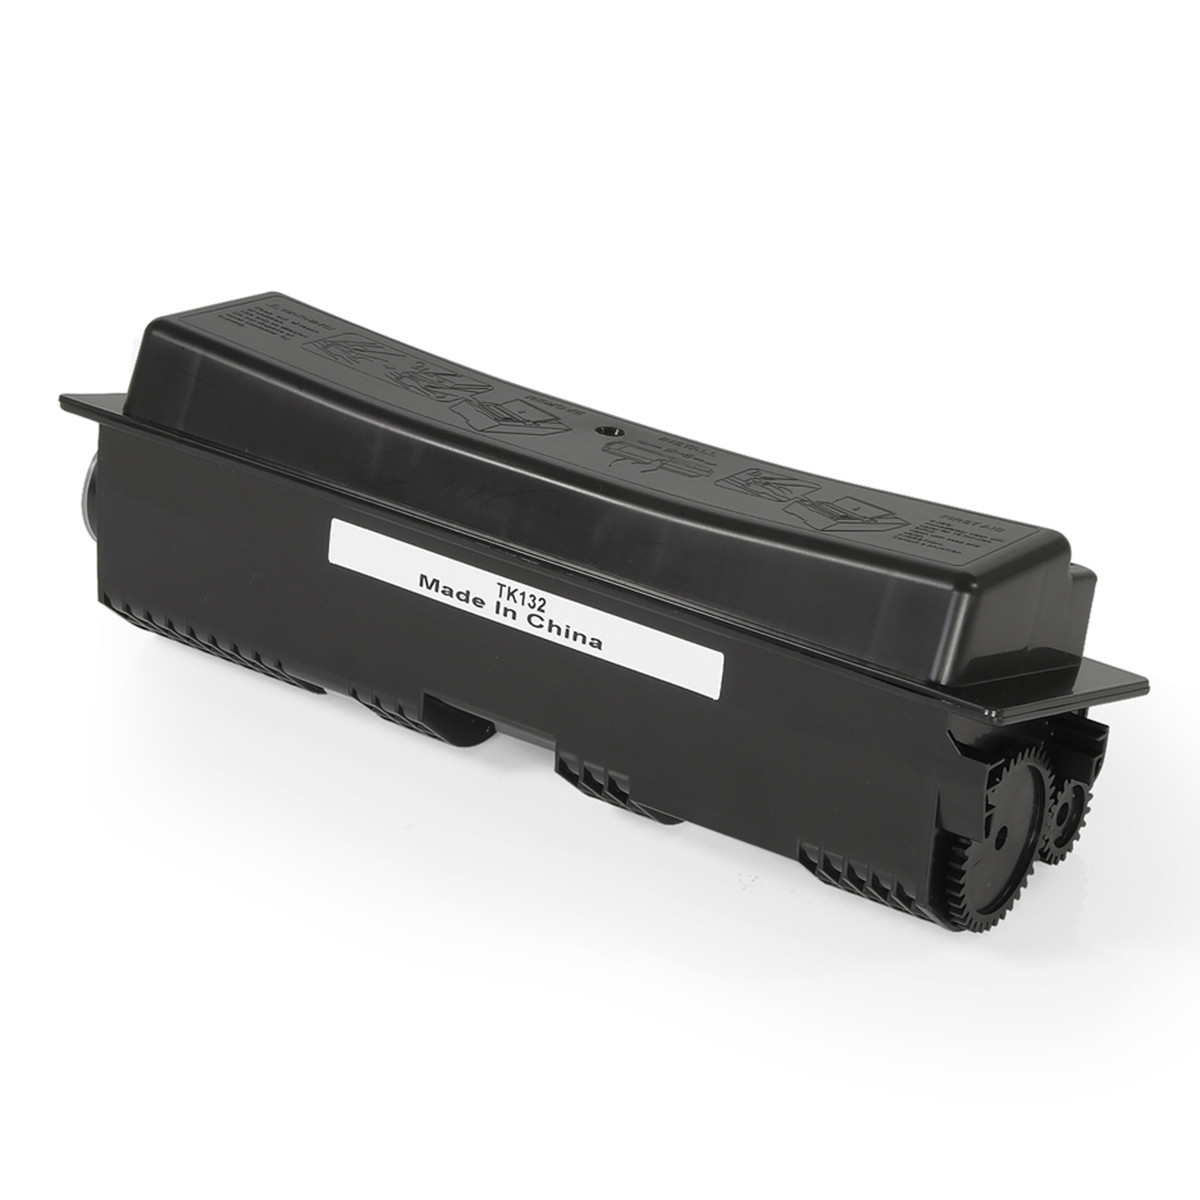 Toner Compatível com Kyocera TK172 TK170 | FS1320D FS1370DN | Zeus 7.2k